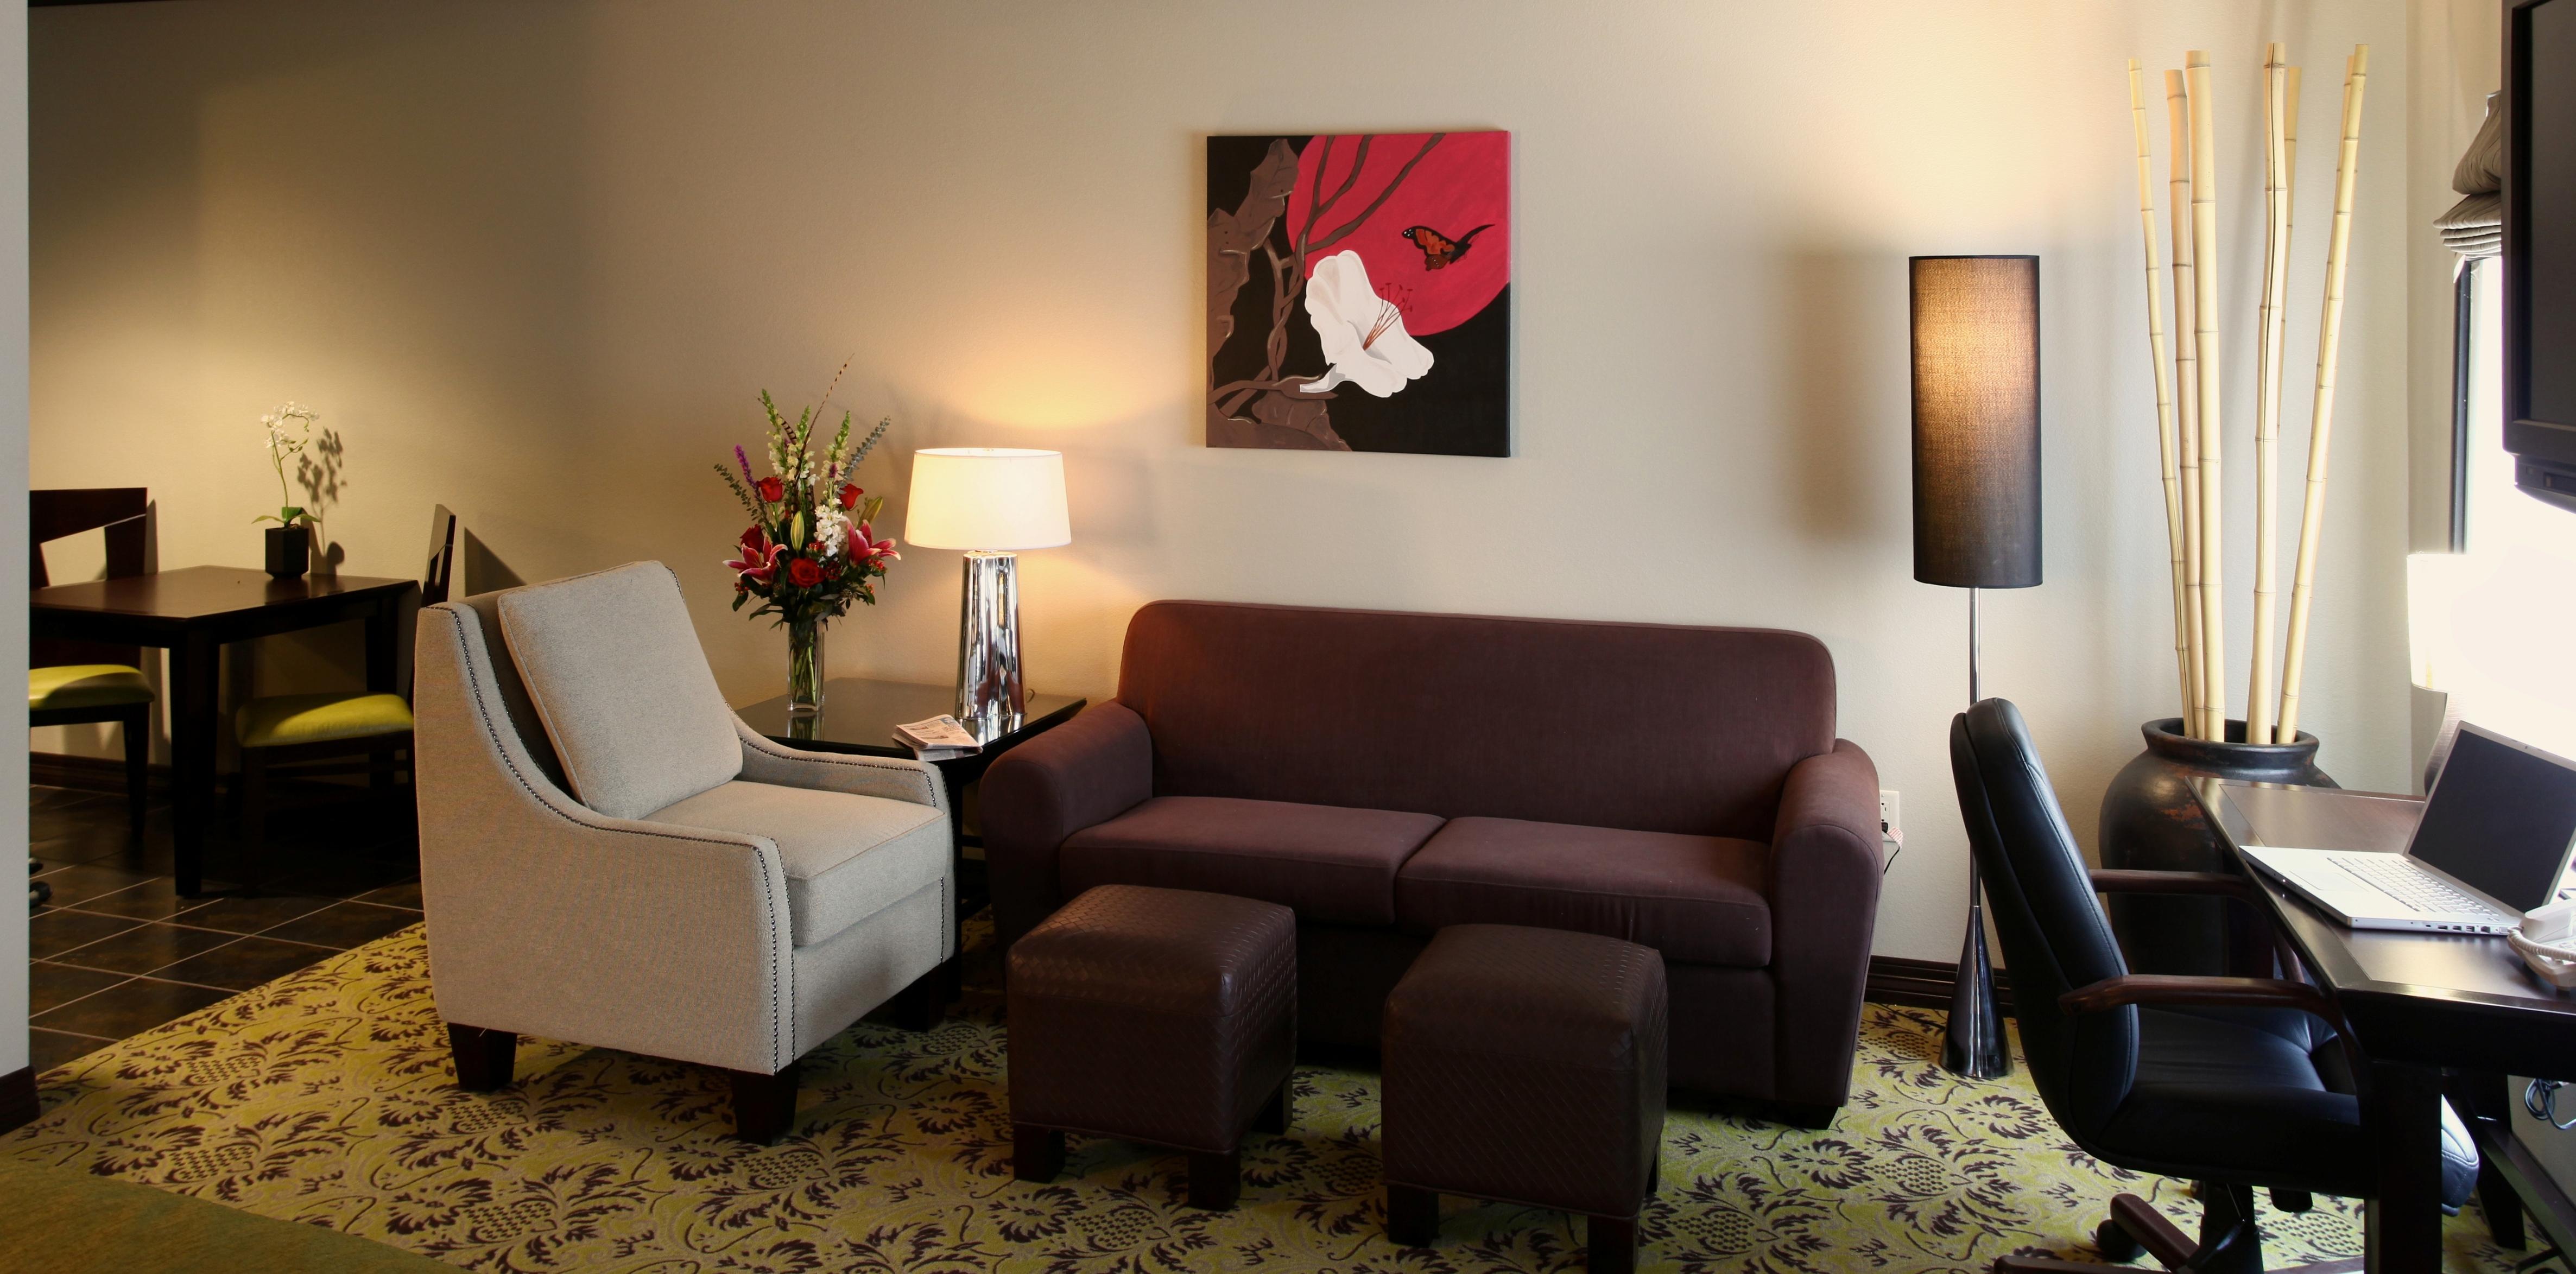 Hawthorn Suites by Wyndham Lubbock image 3